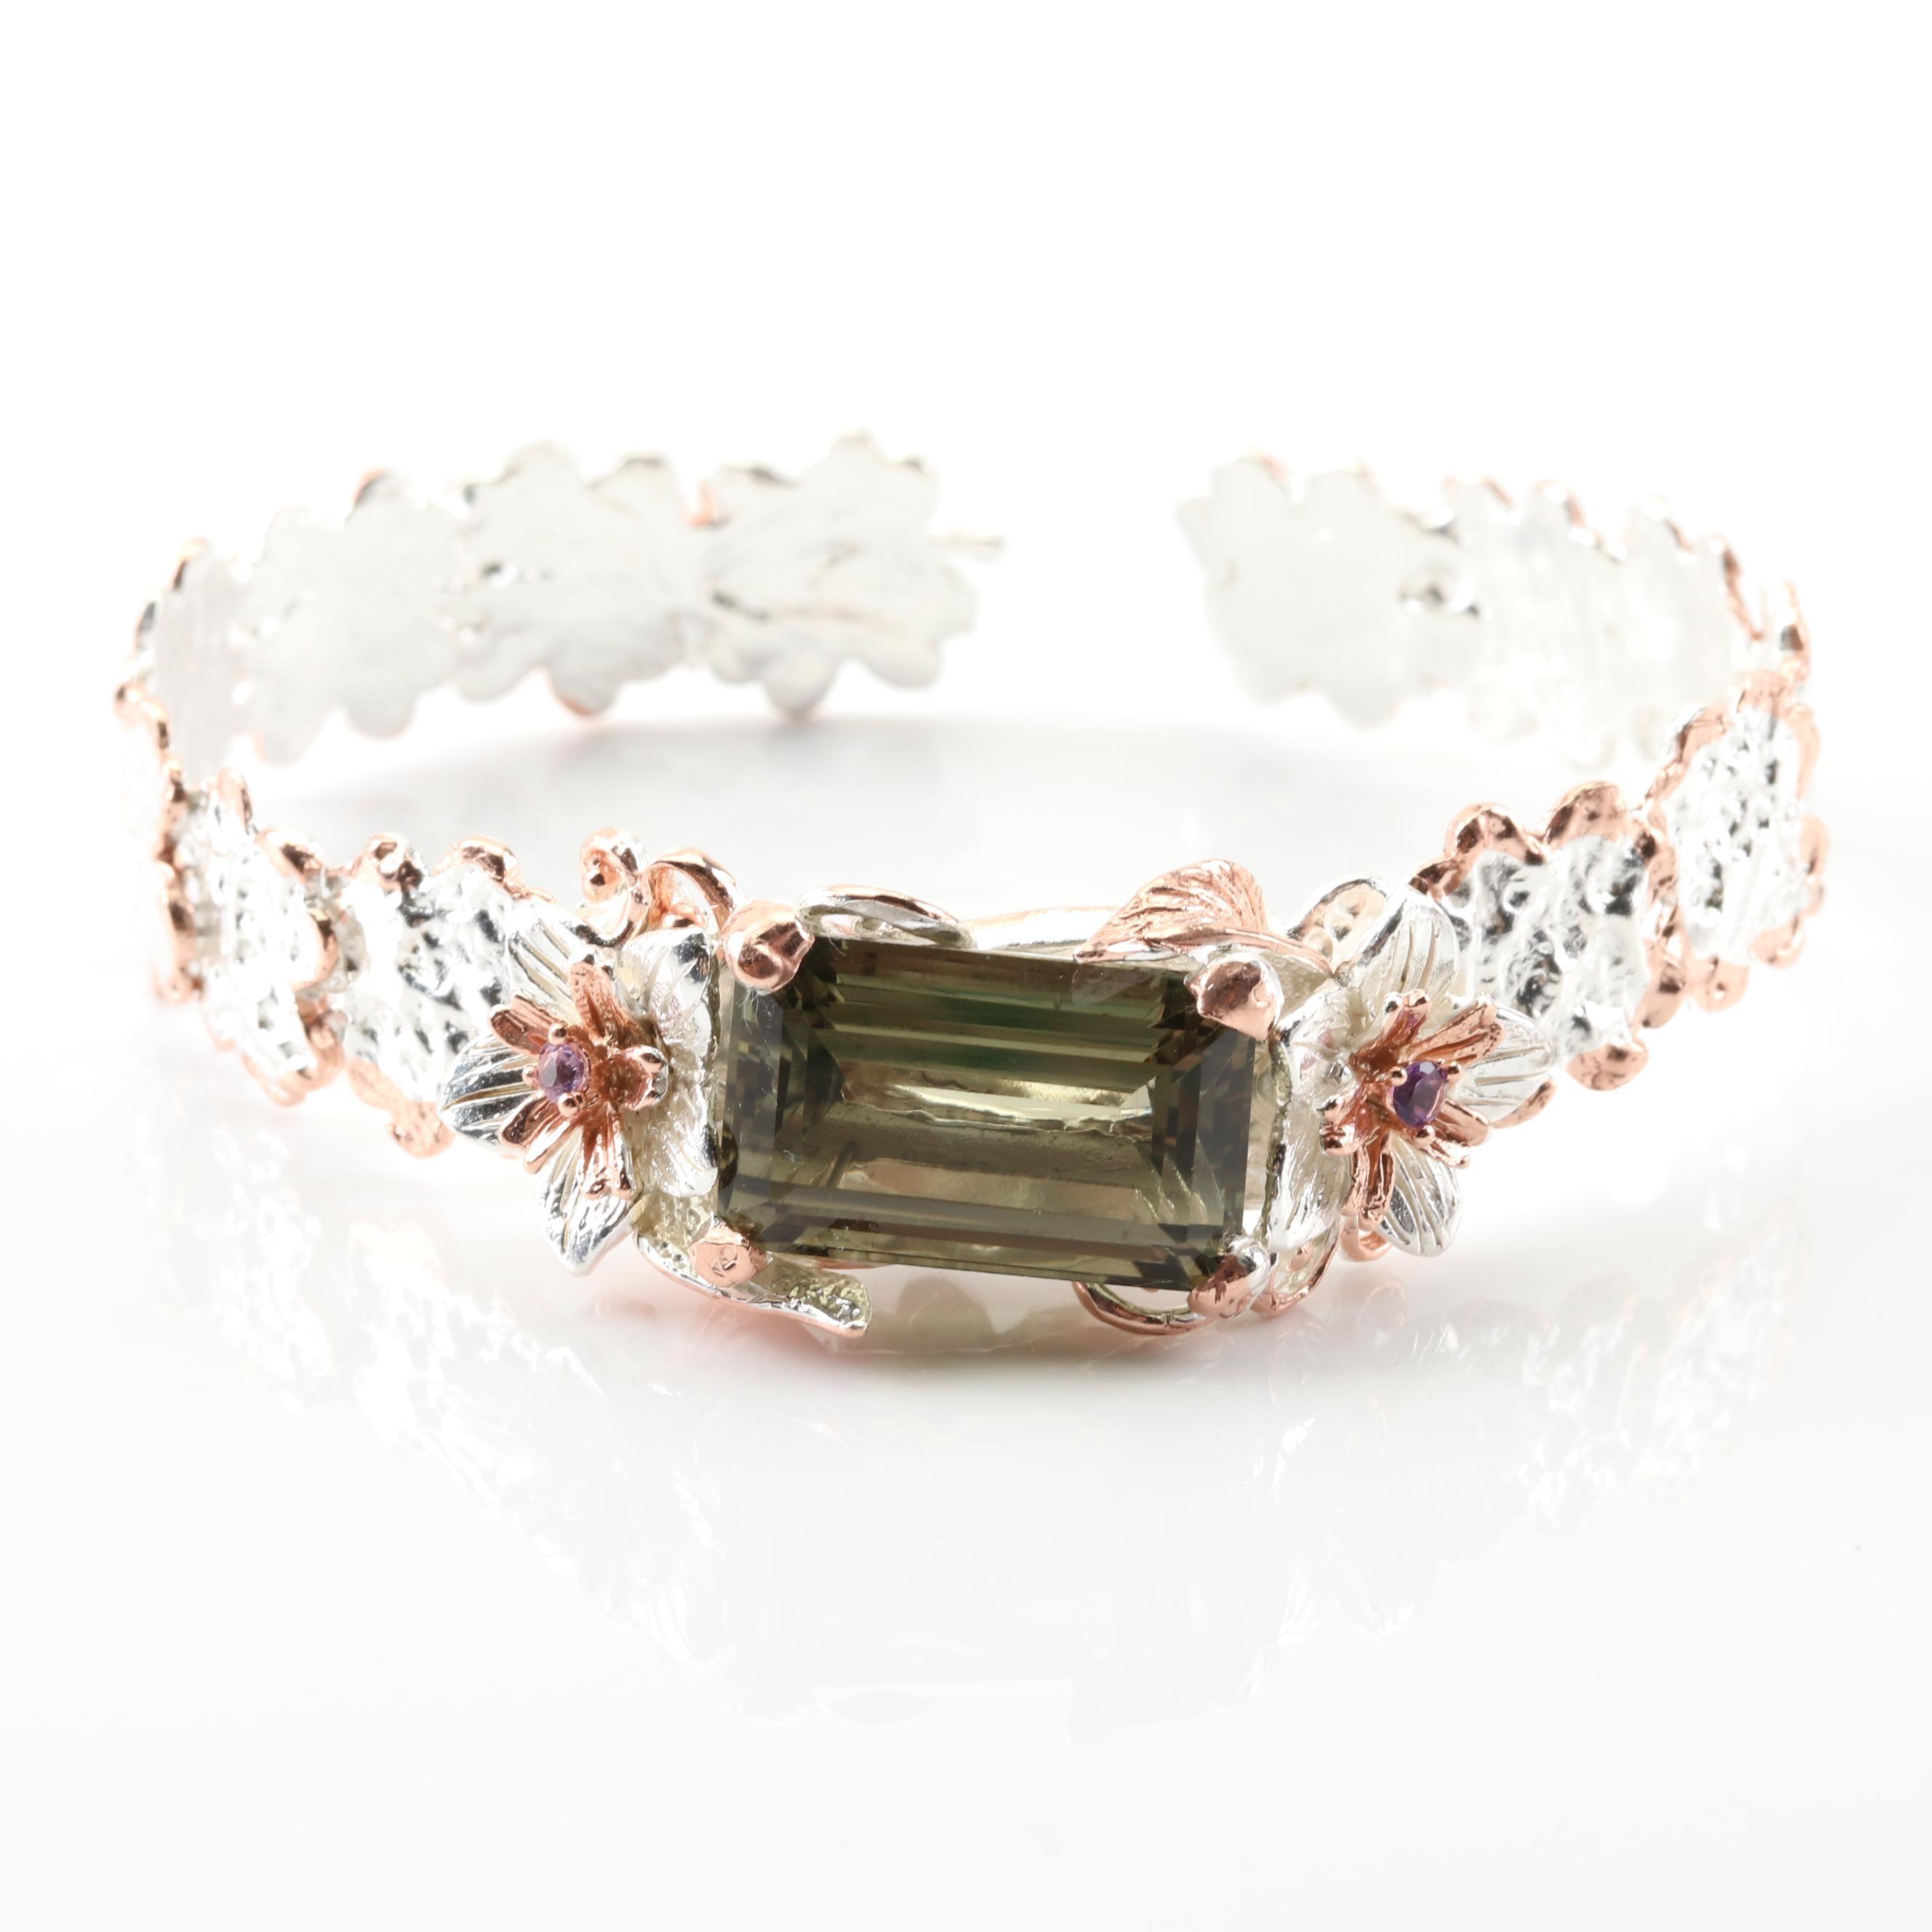 Sterling Silver 18.76 CT Green Quartz and Amethyst Flower Cuff Bracelet